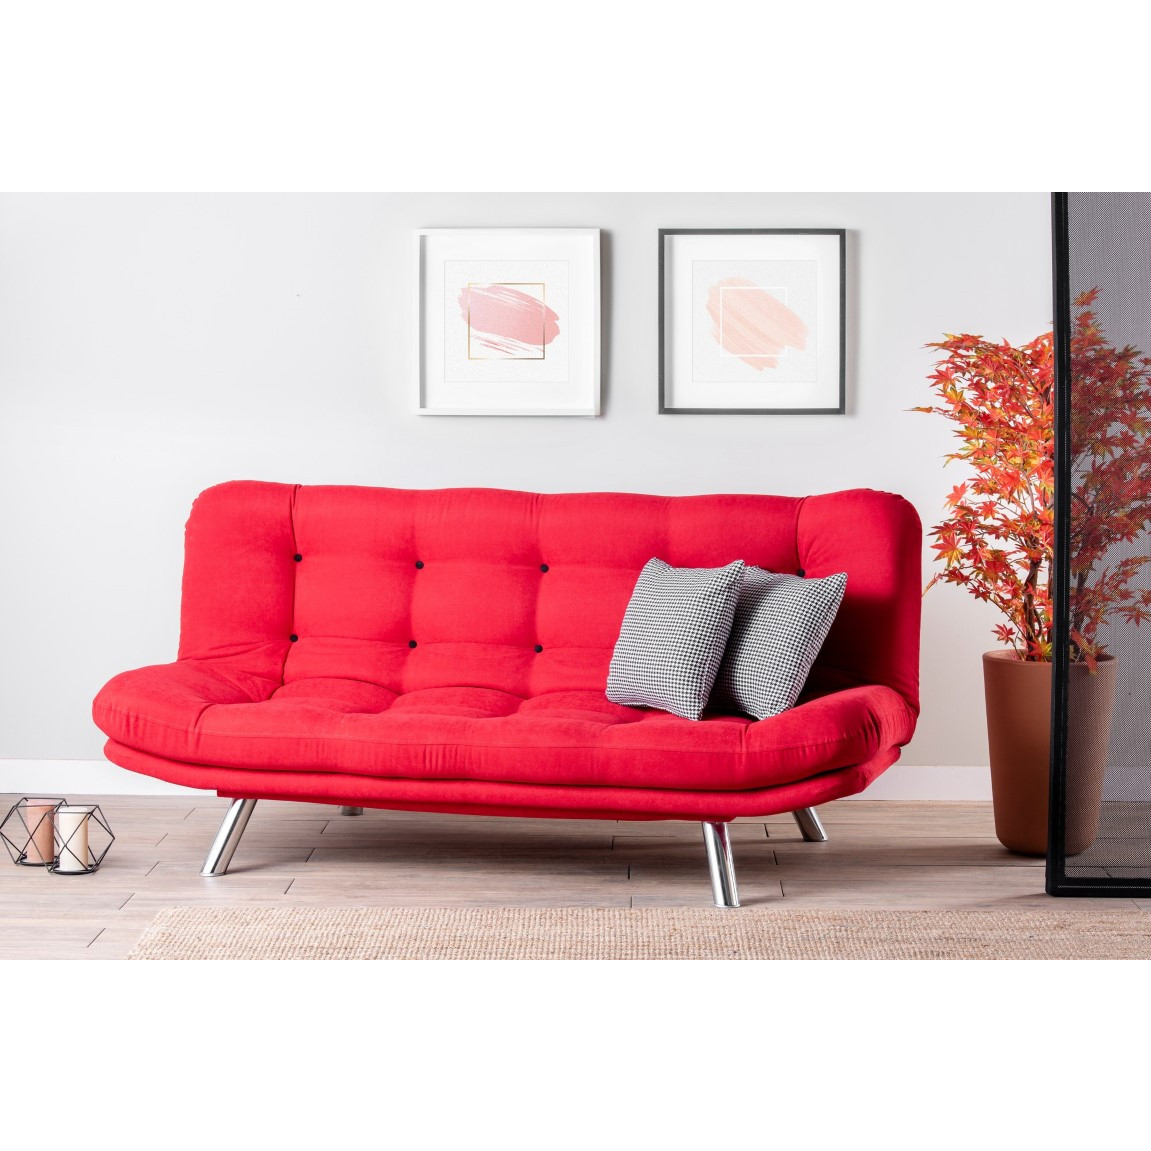 3-Sitzer-Sofabett Misa | Rot